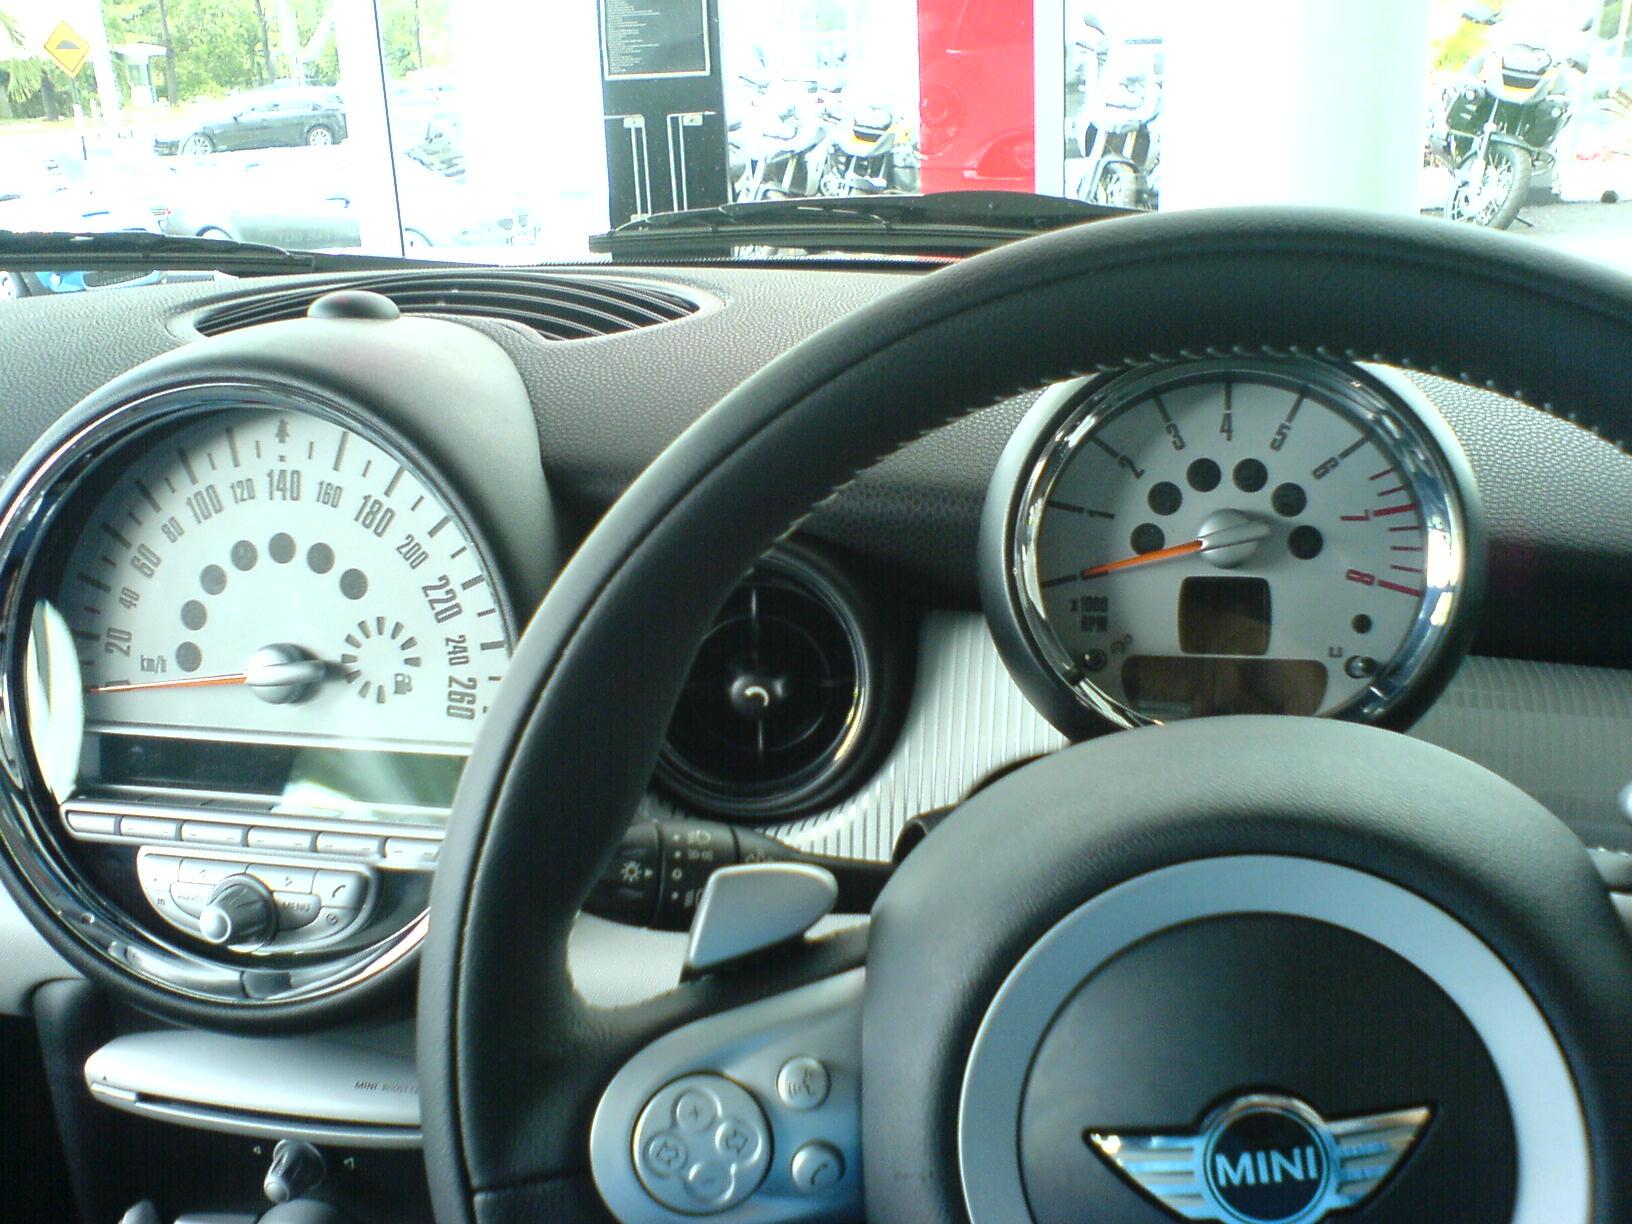 Mini Cooper S steering and Instruments Mitsubishi Evolution 7 steering wheel